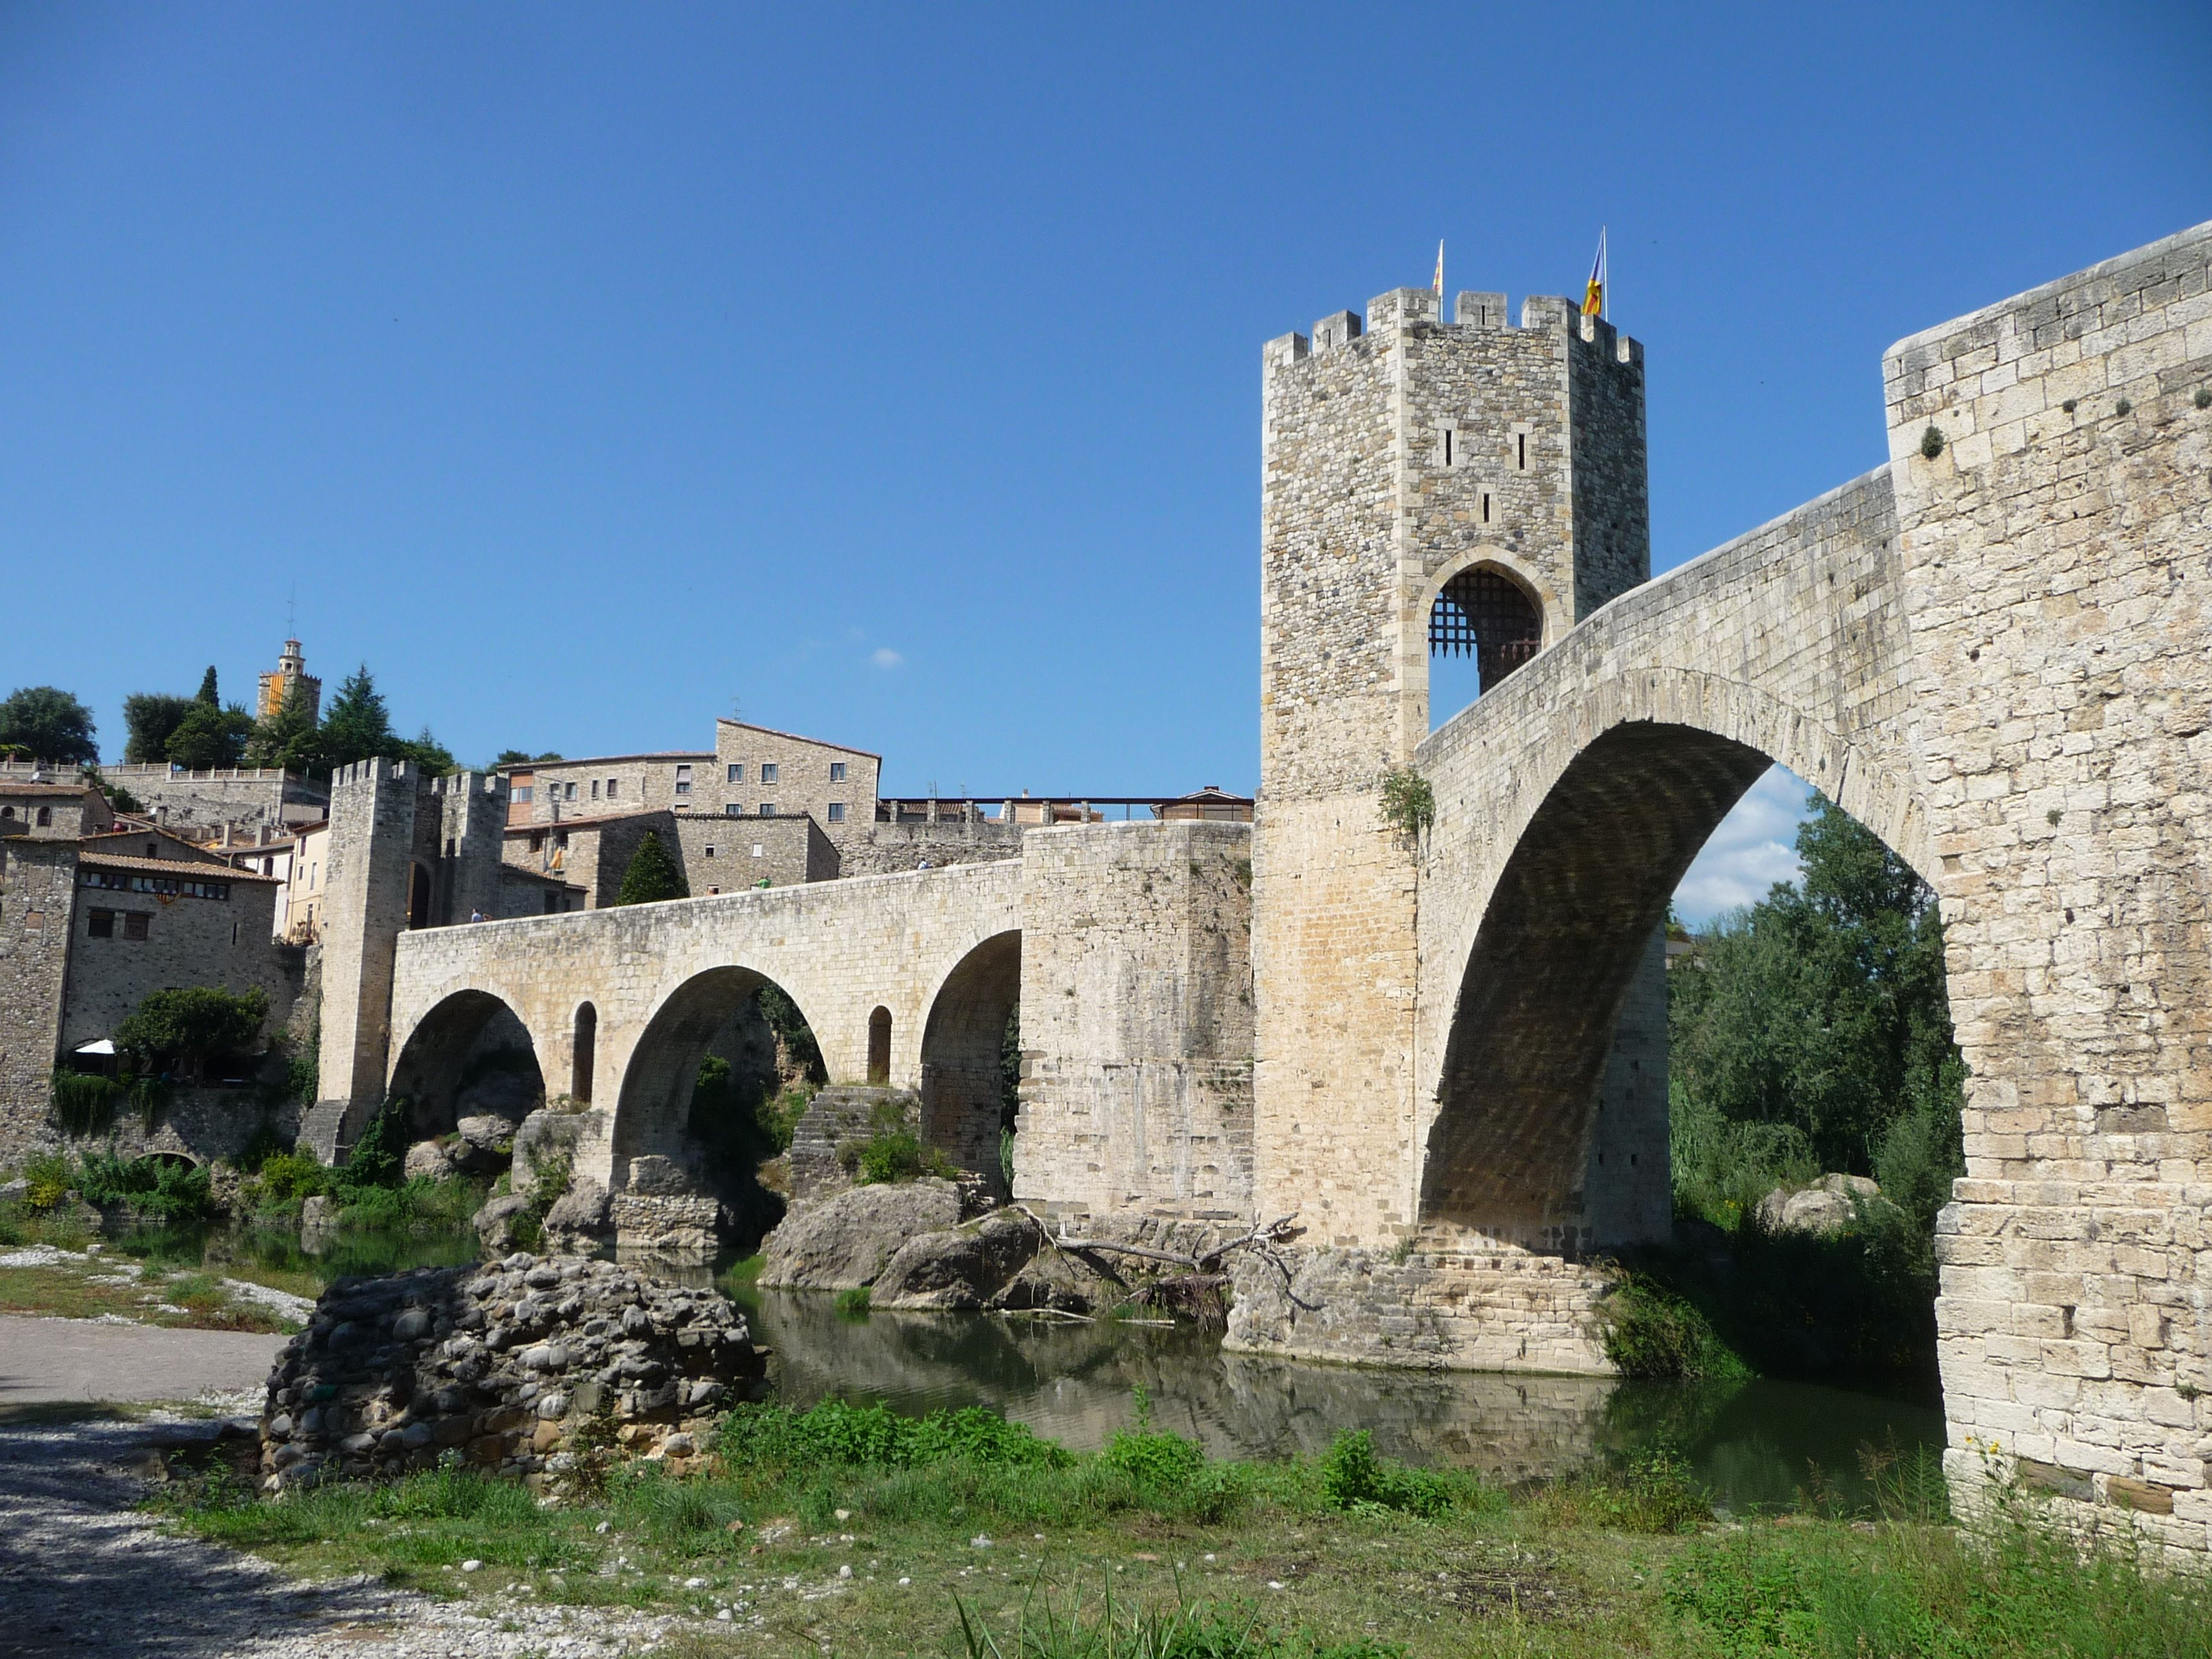 Besalu bridge, North Spain. by B Waddington